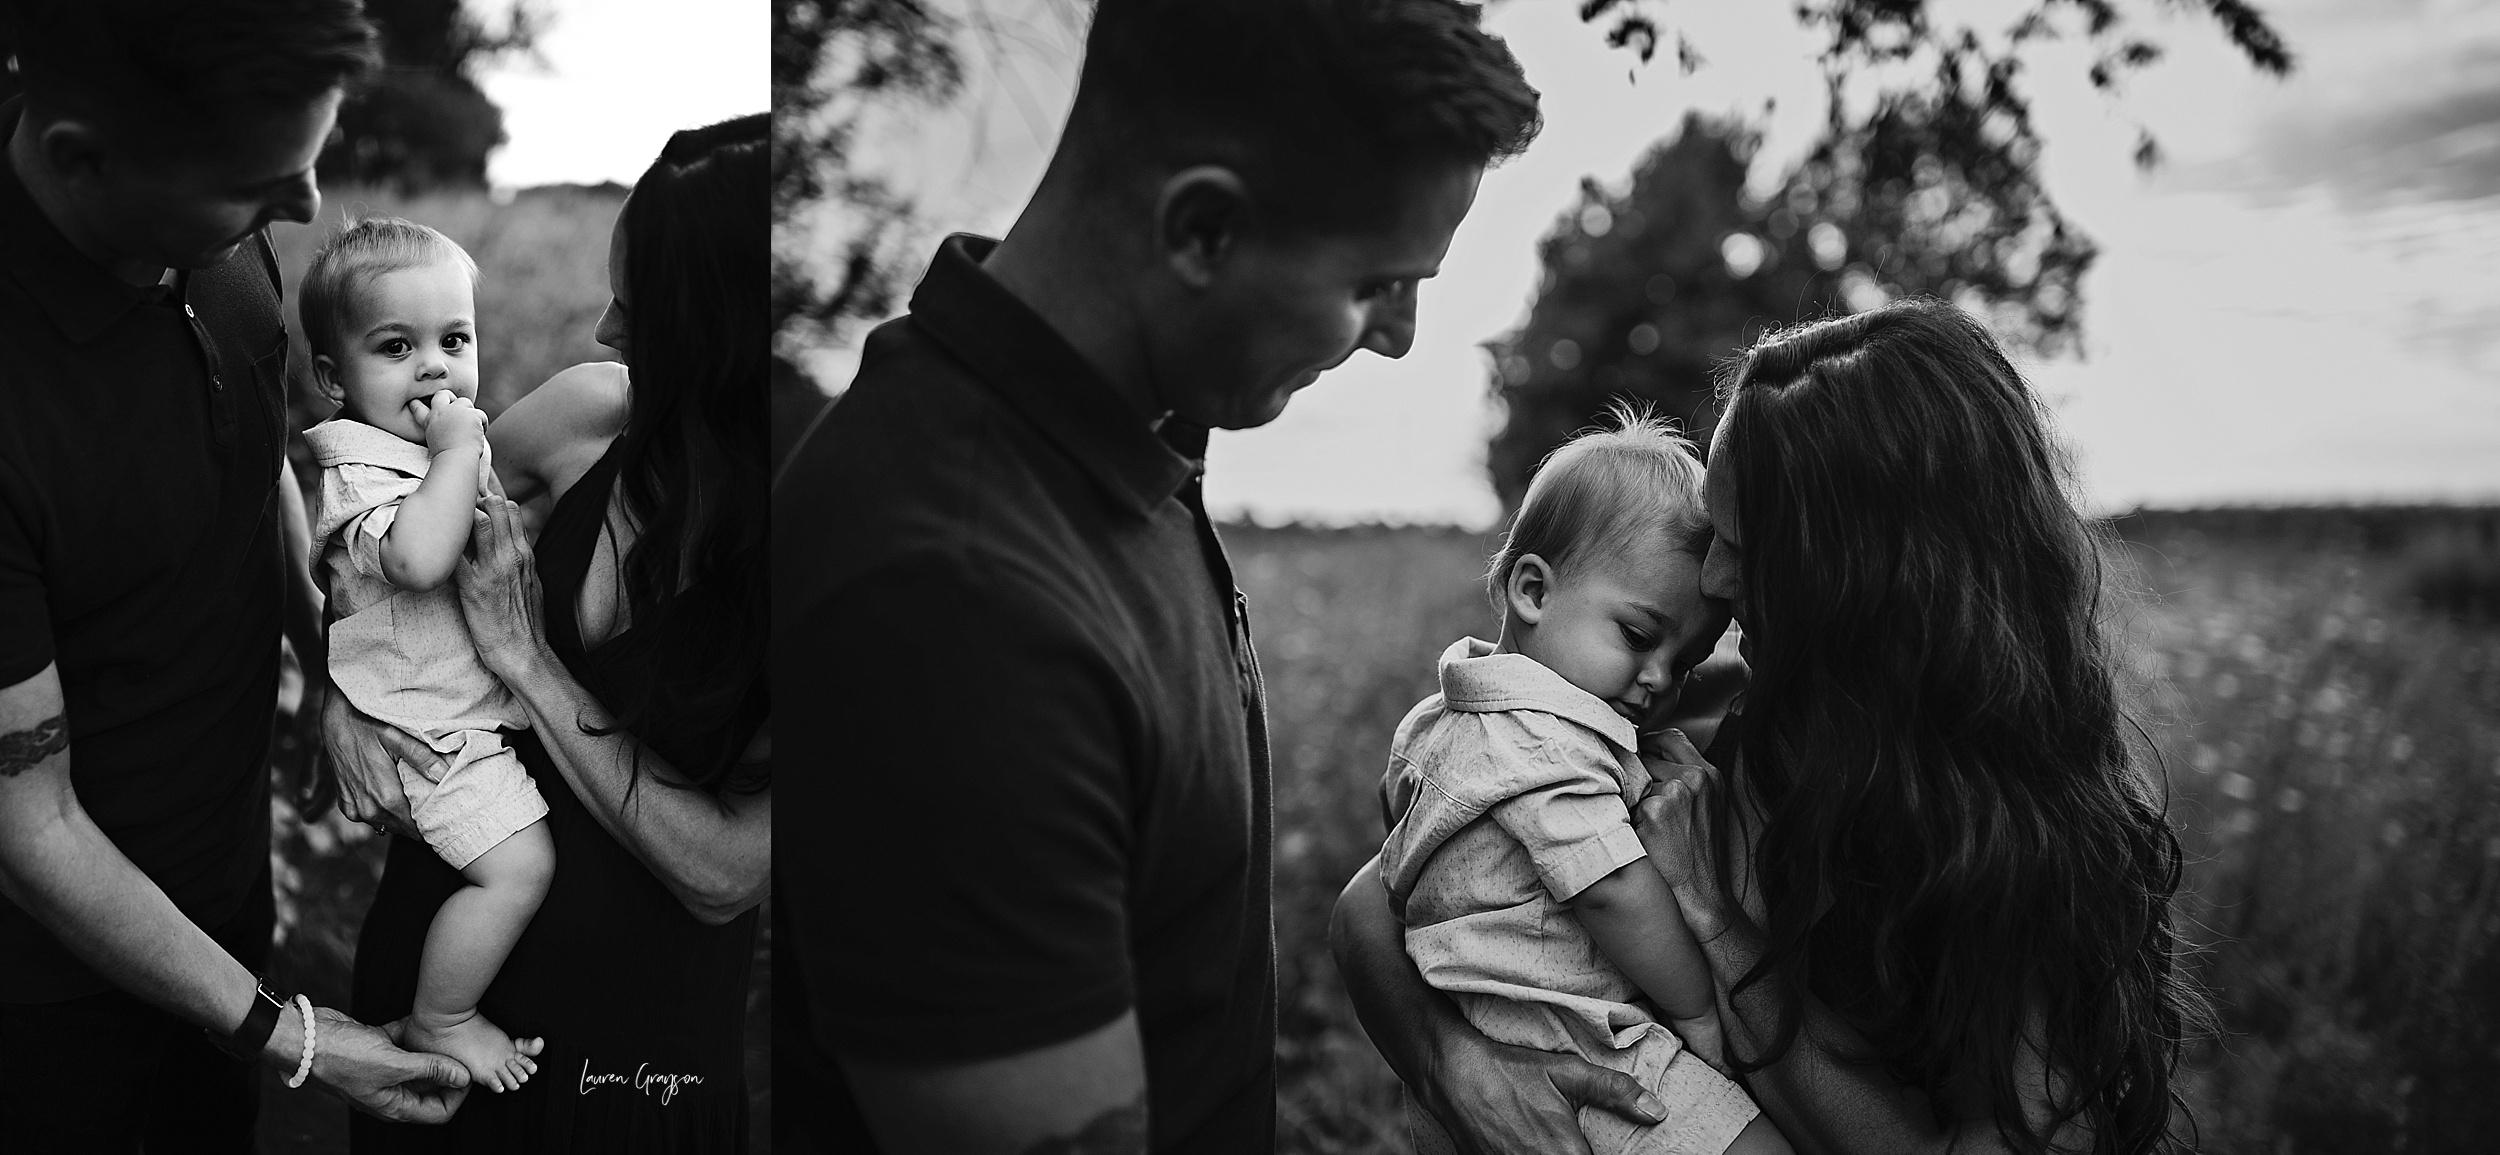 lauren-grayson-photography-cleveland-ohio-photographer-AKRON-family-photos-springfield-bog-cullin-first-birthday_0795.jpg